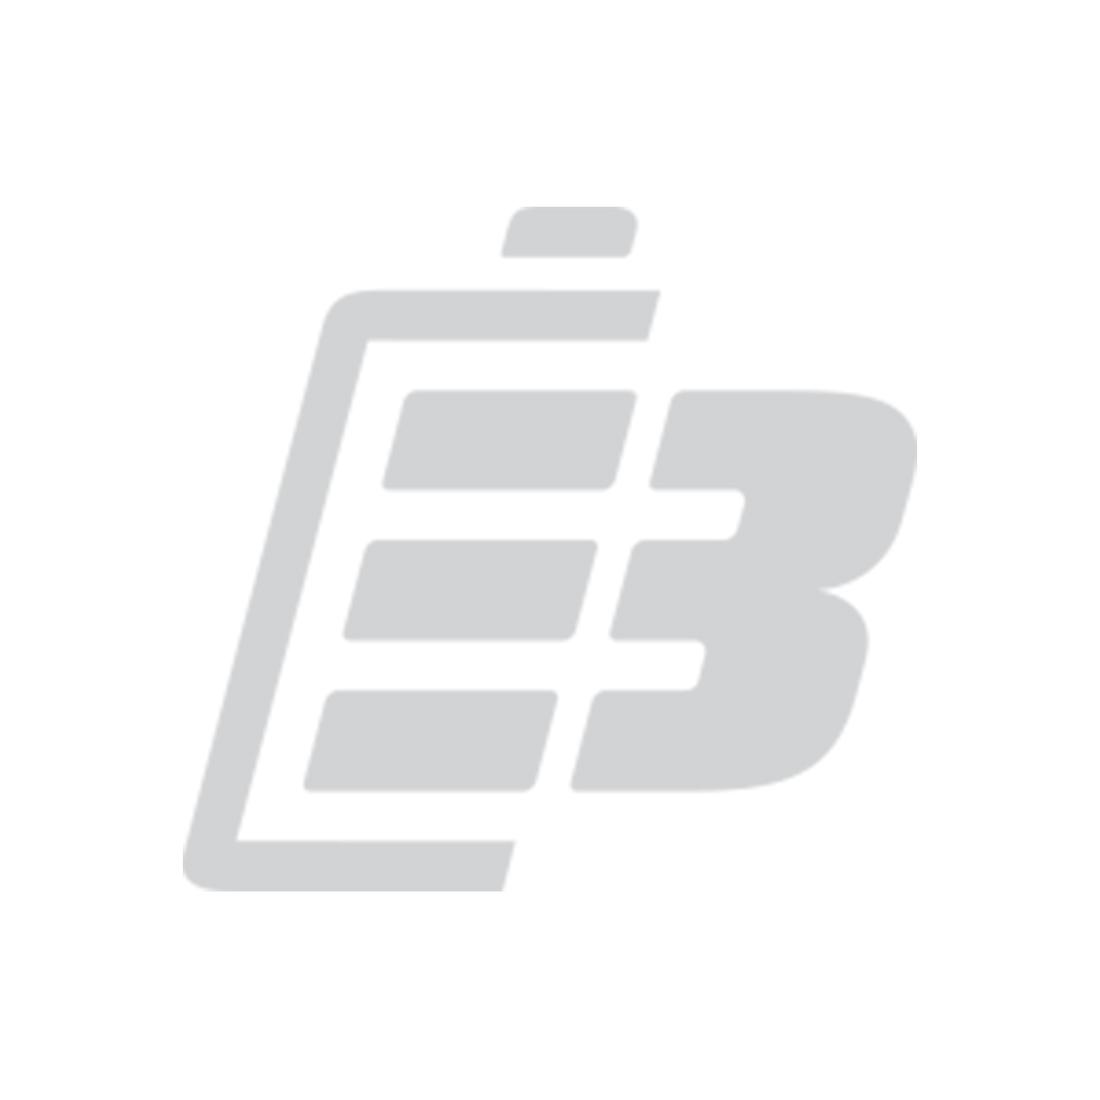 Fenix ALG-05 TAC Remote Pressure Switch Rail Mount